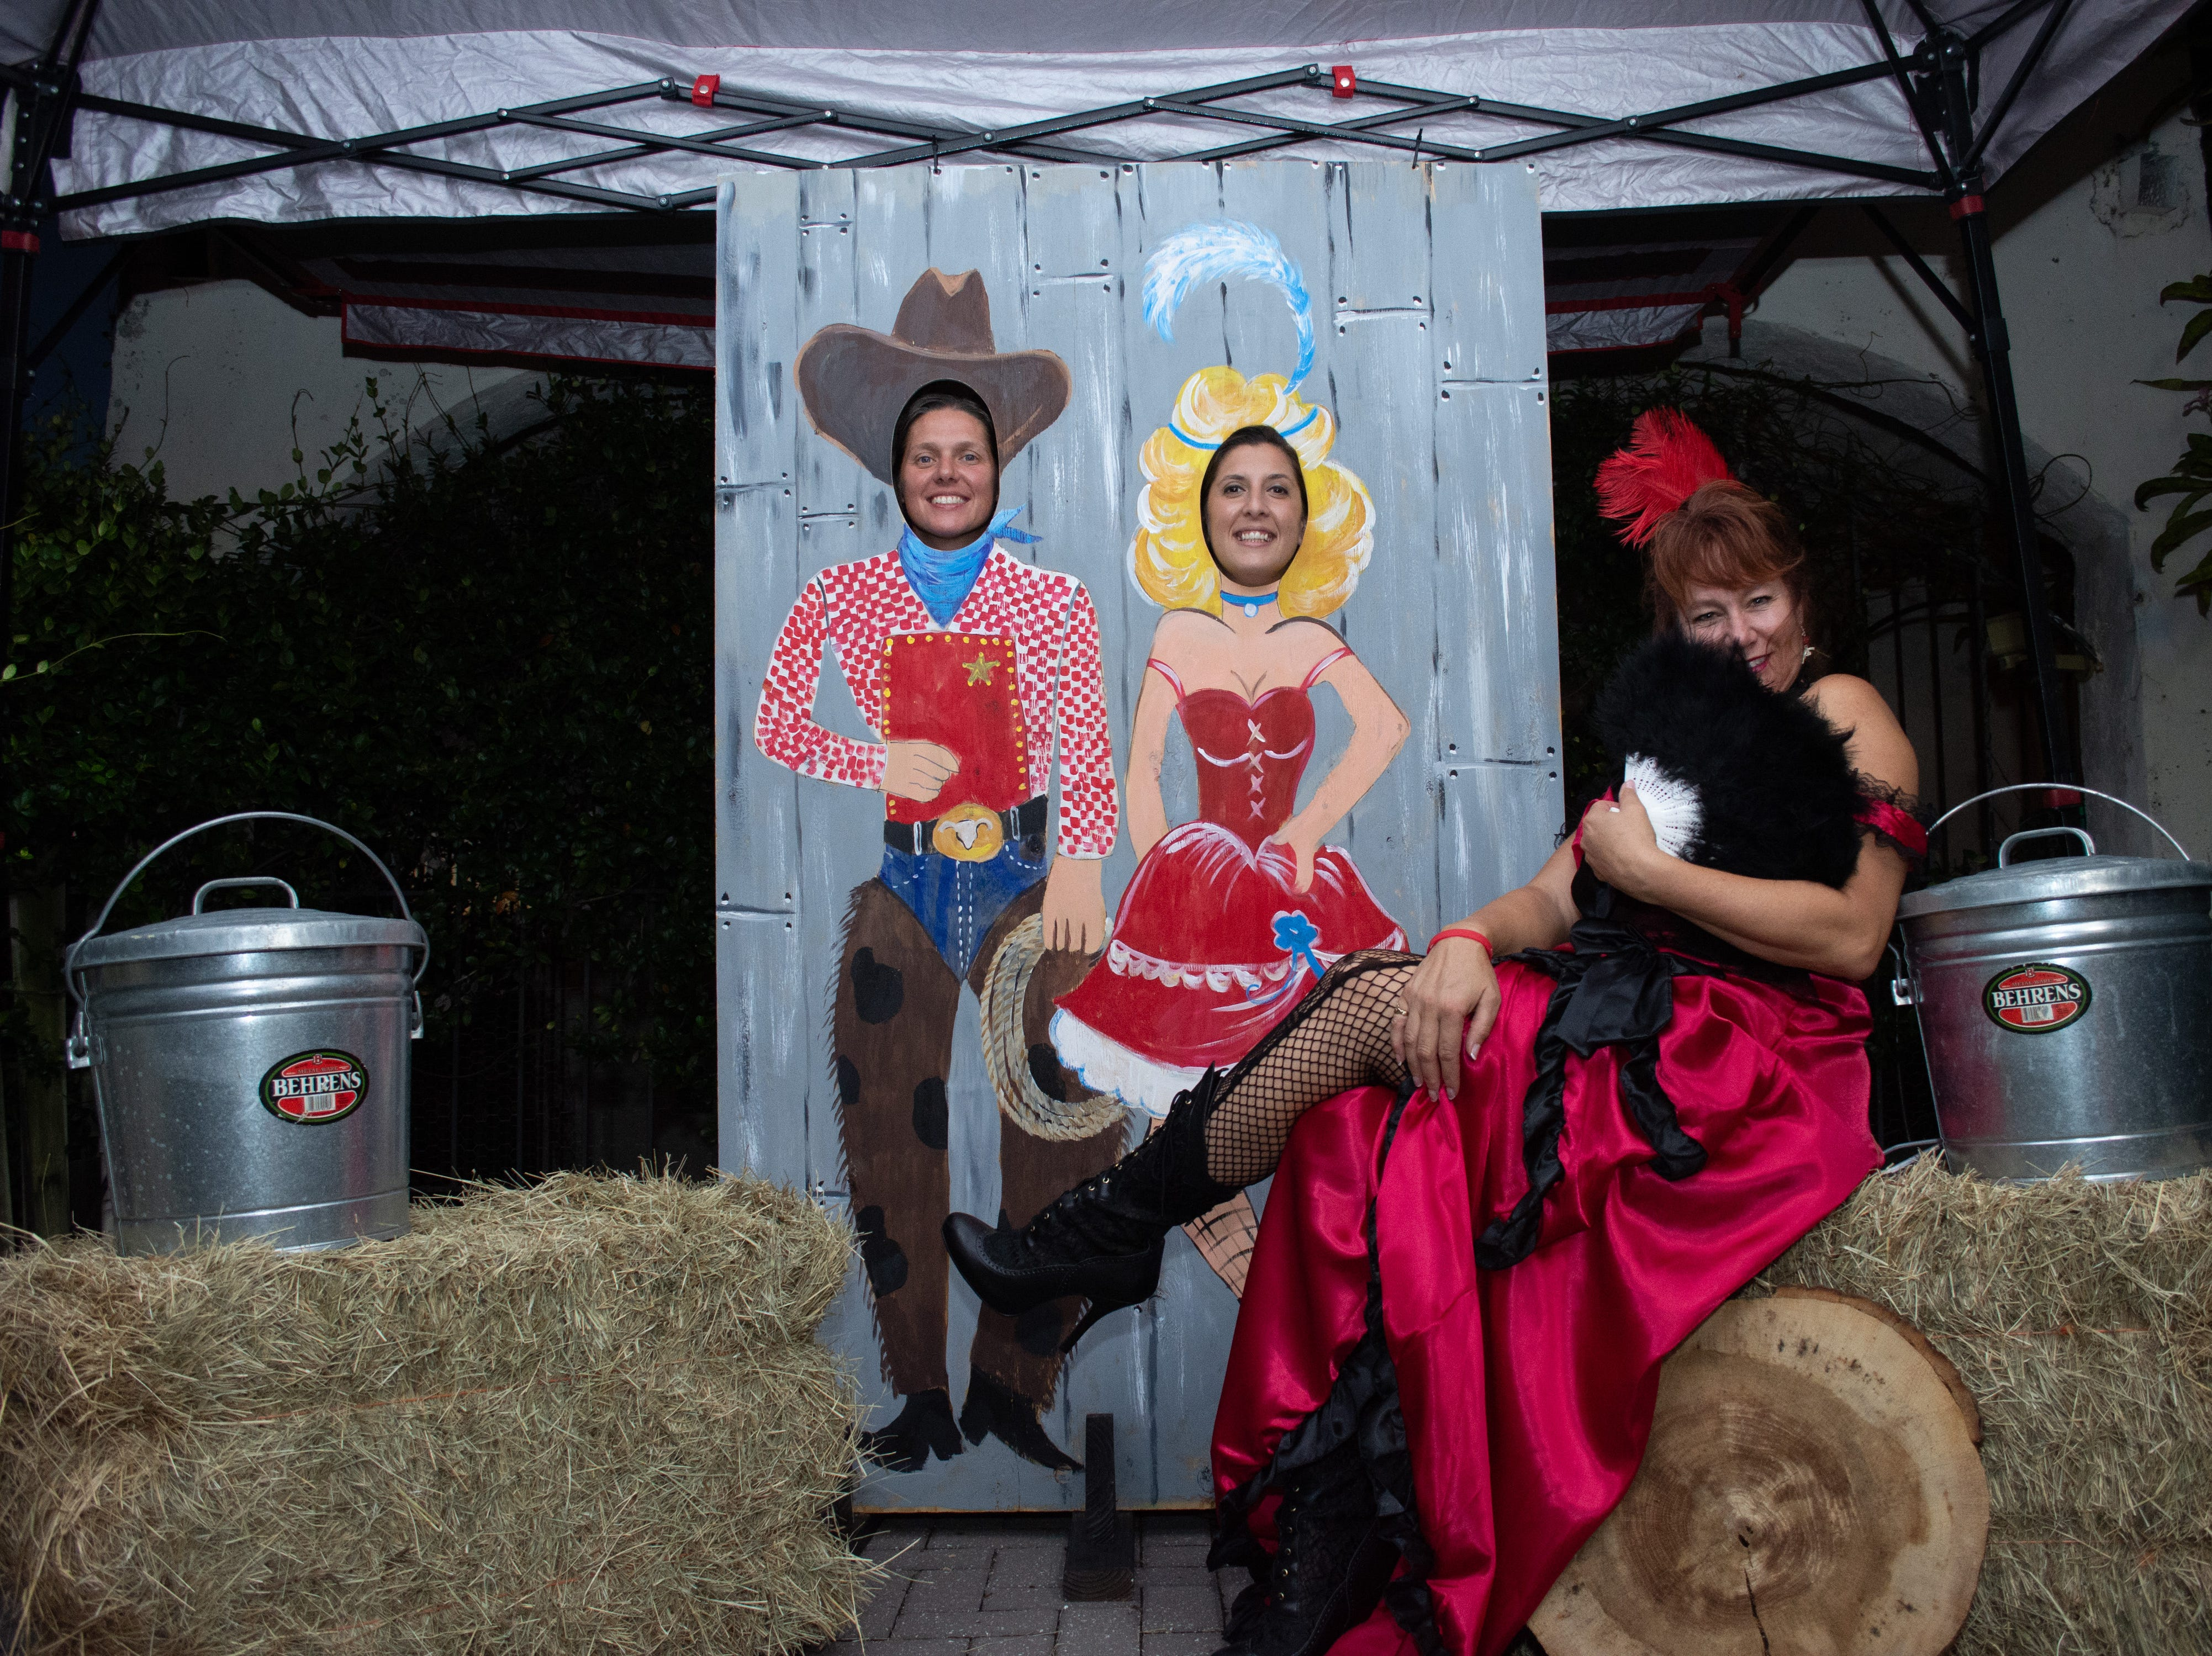 Tami Sarno, Ali Sarno, and Tami Leliuga-Shriver pose for a photo. Arron Lampkin/For FLORIDA TODAY